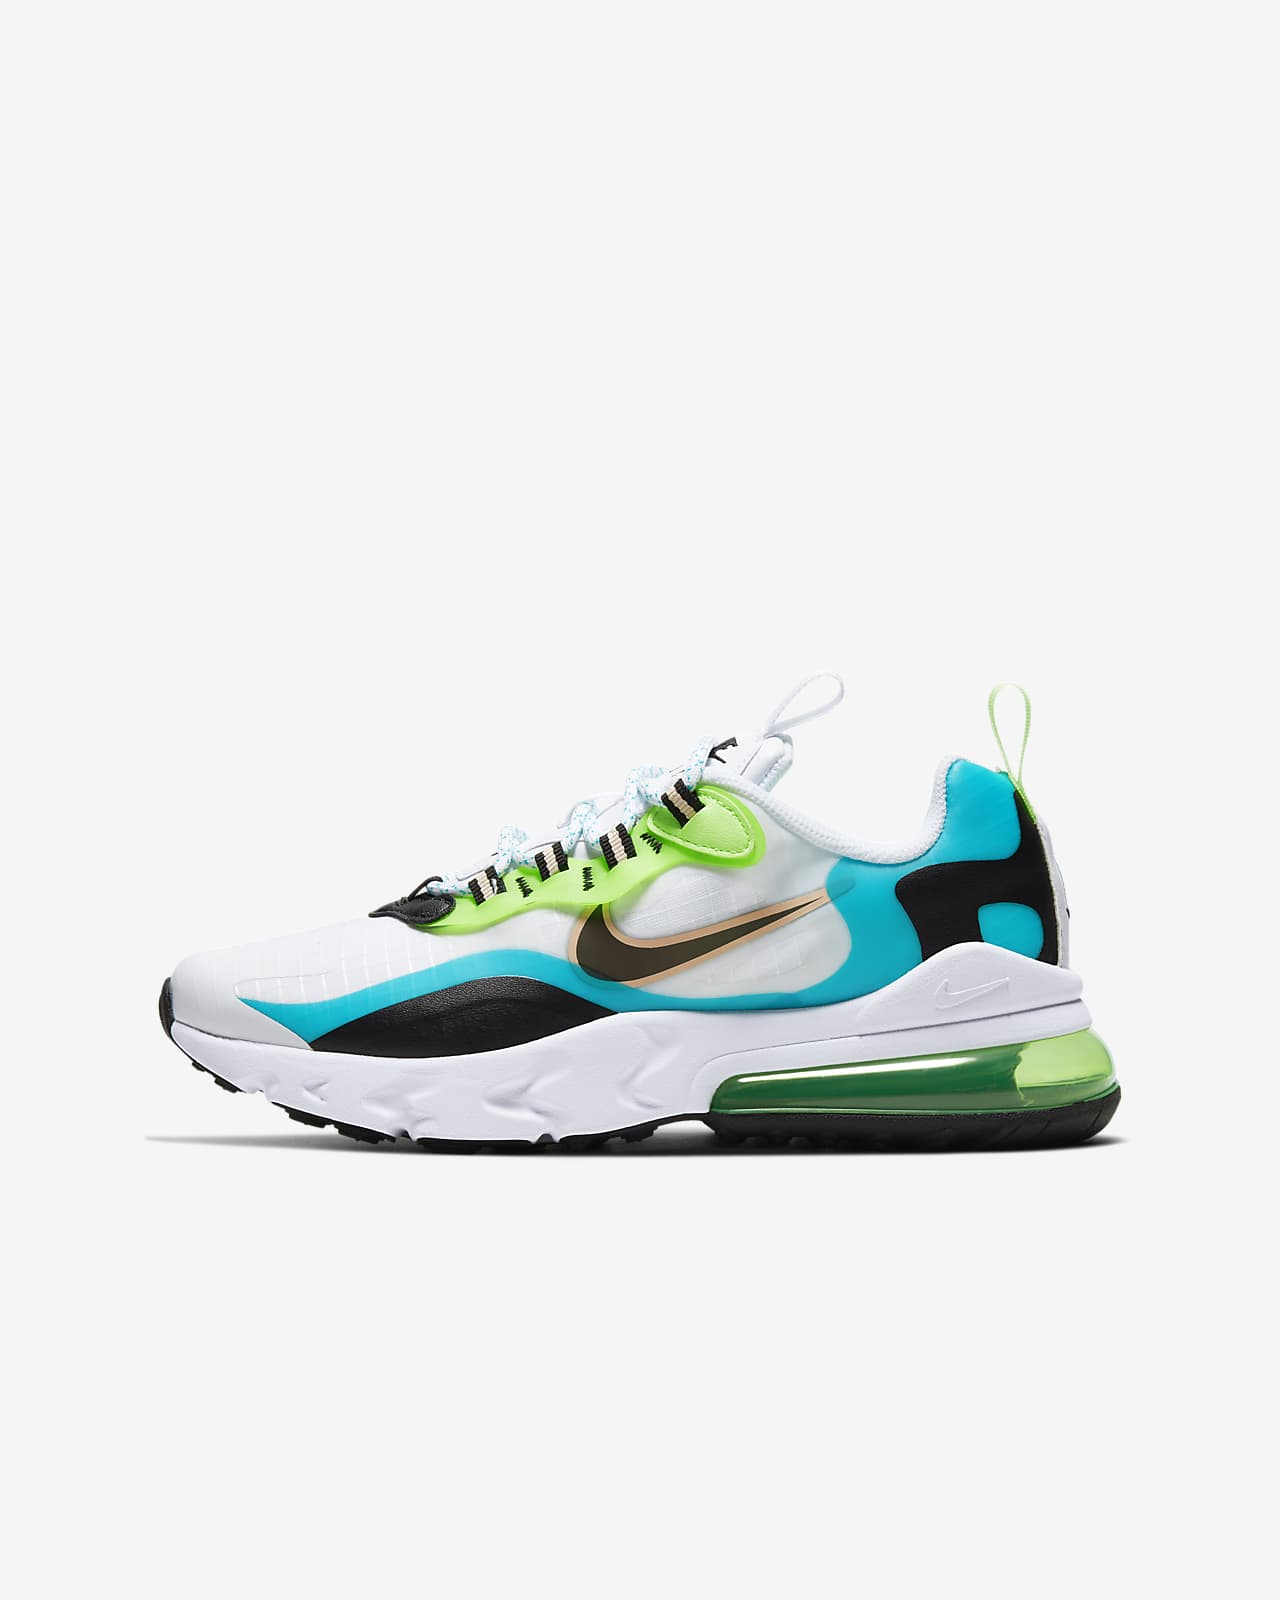 Sko Nike Air Max 270 React SE för ungdom